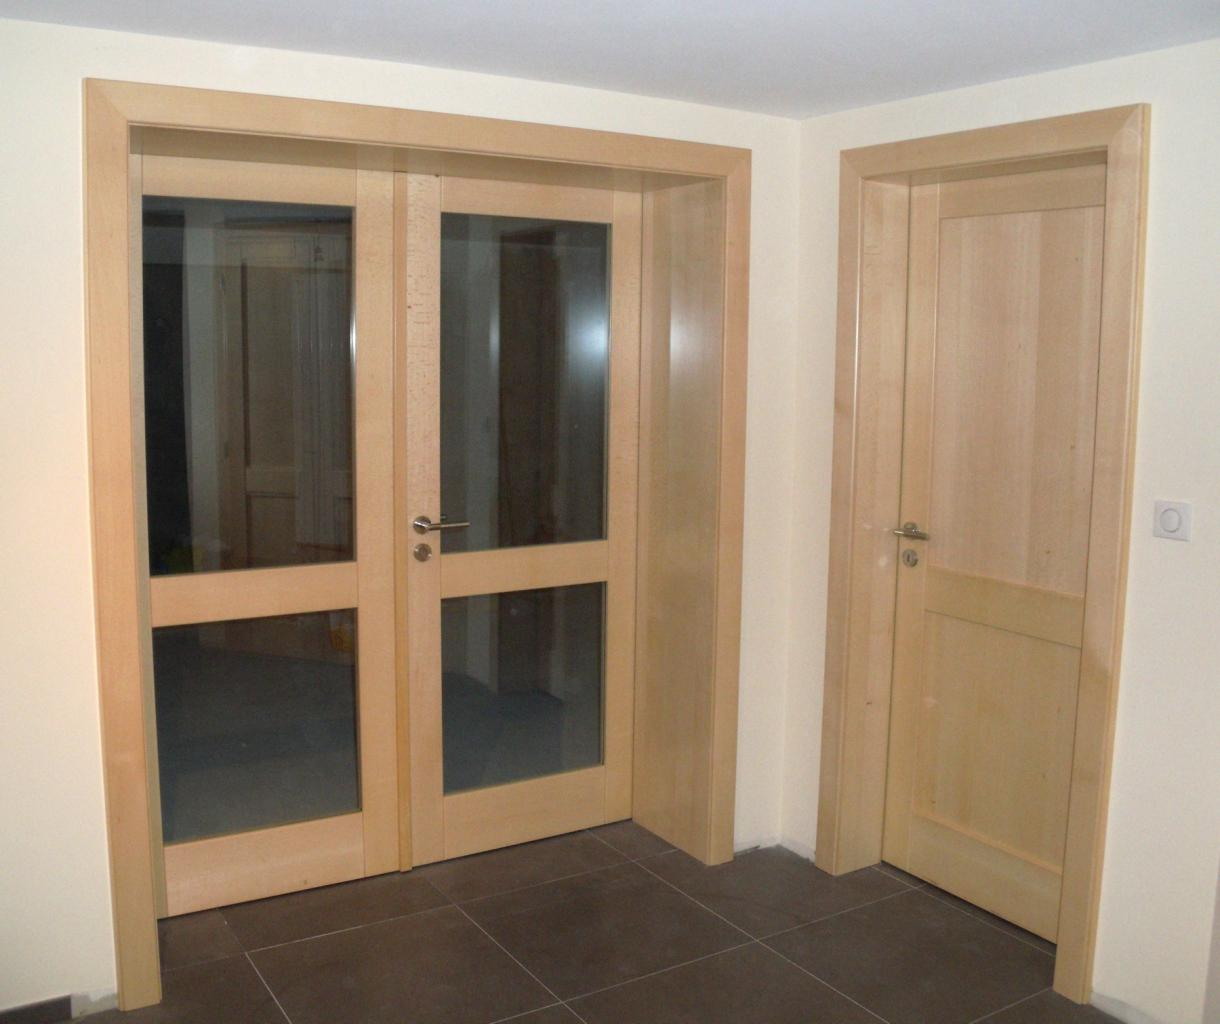 Rutiporte lavigne portes int rieures for Porte placard vitree